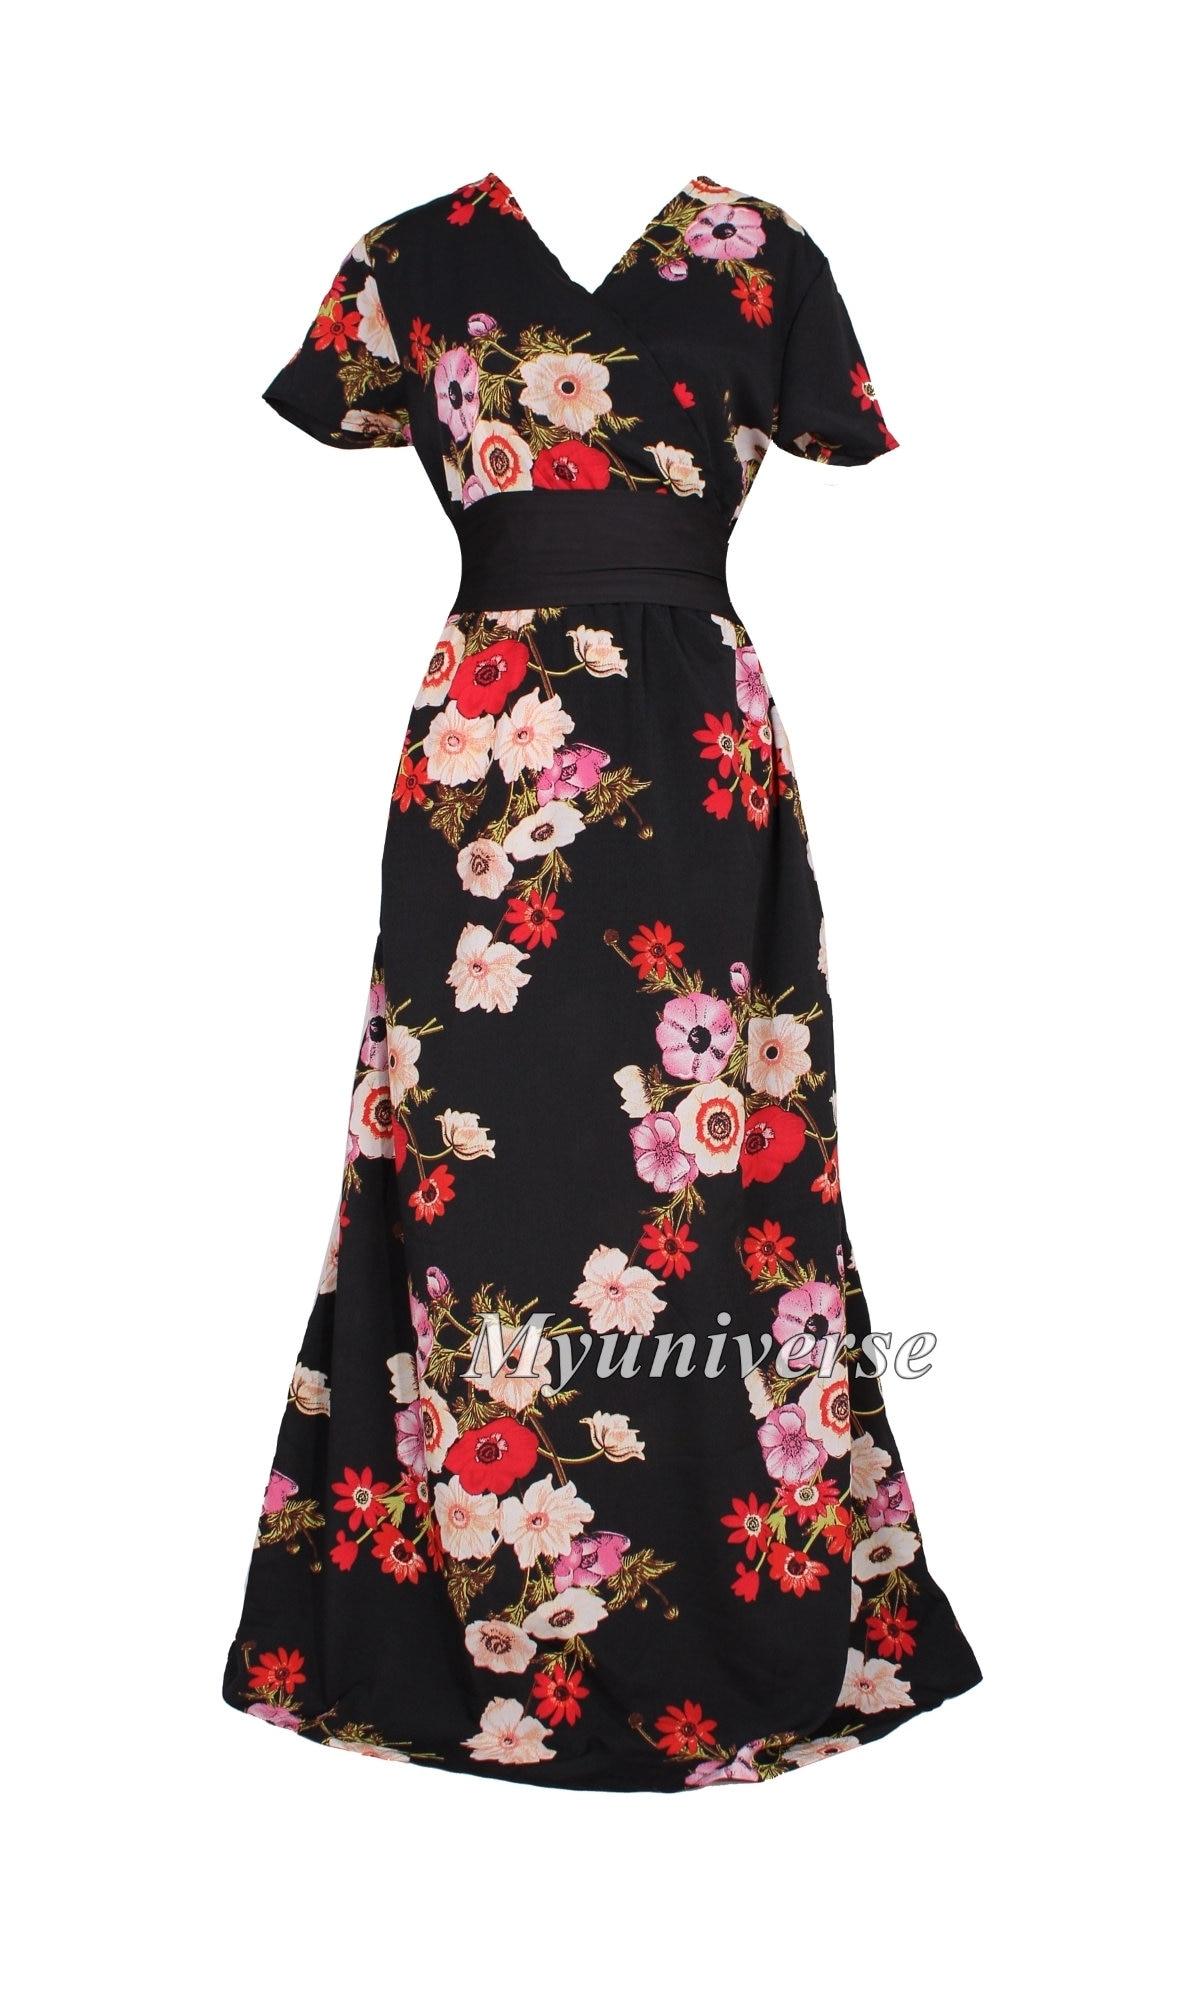 ecbff46d3a551 Plus Size Dress Maxi Dress Women Long Floral Maternity Dress | Etsy